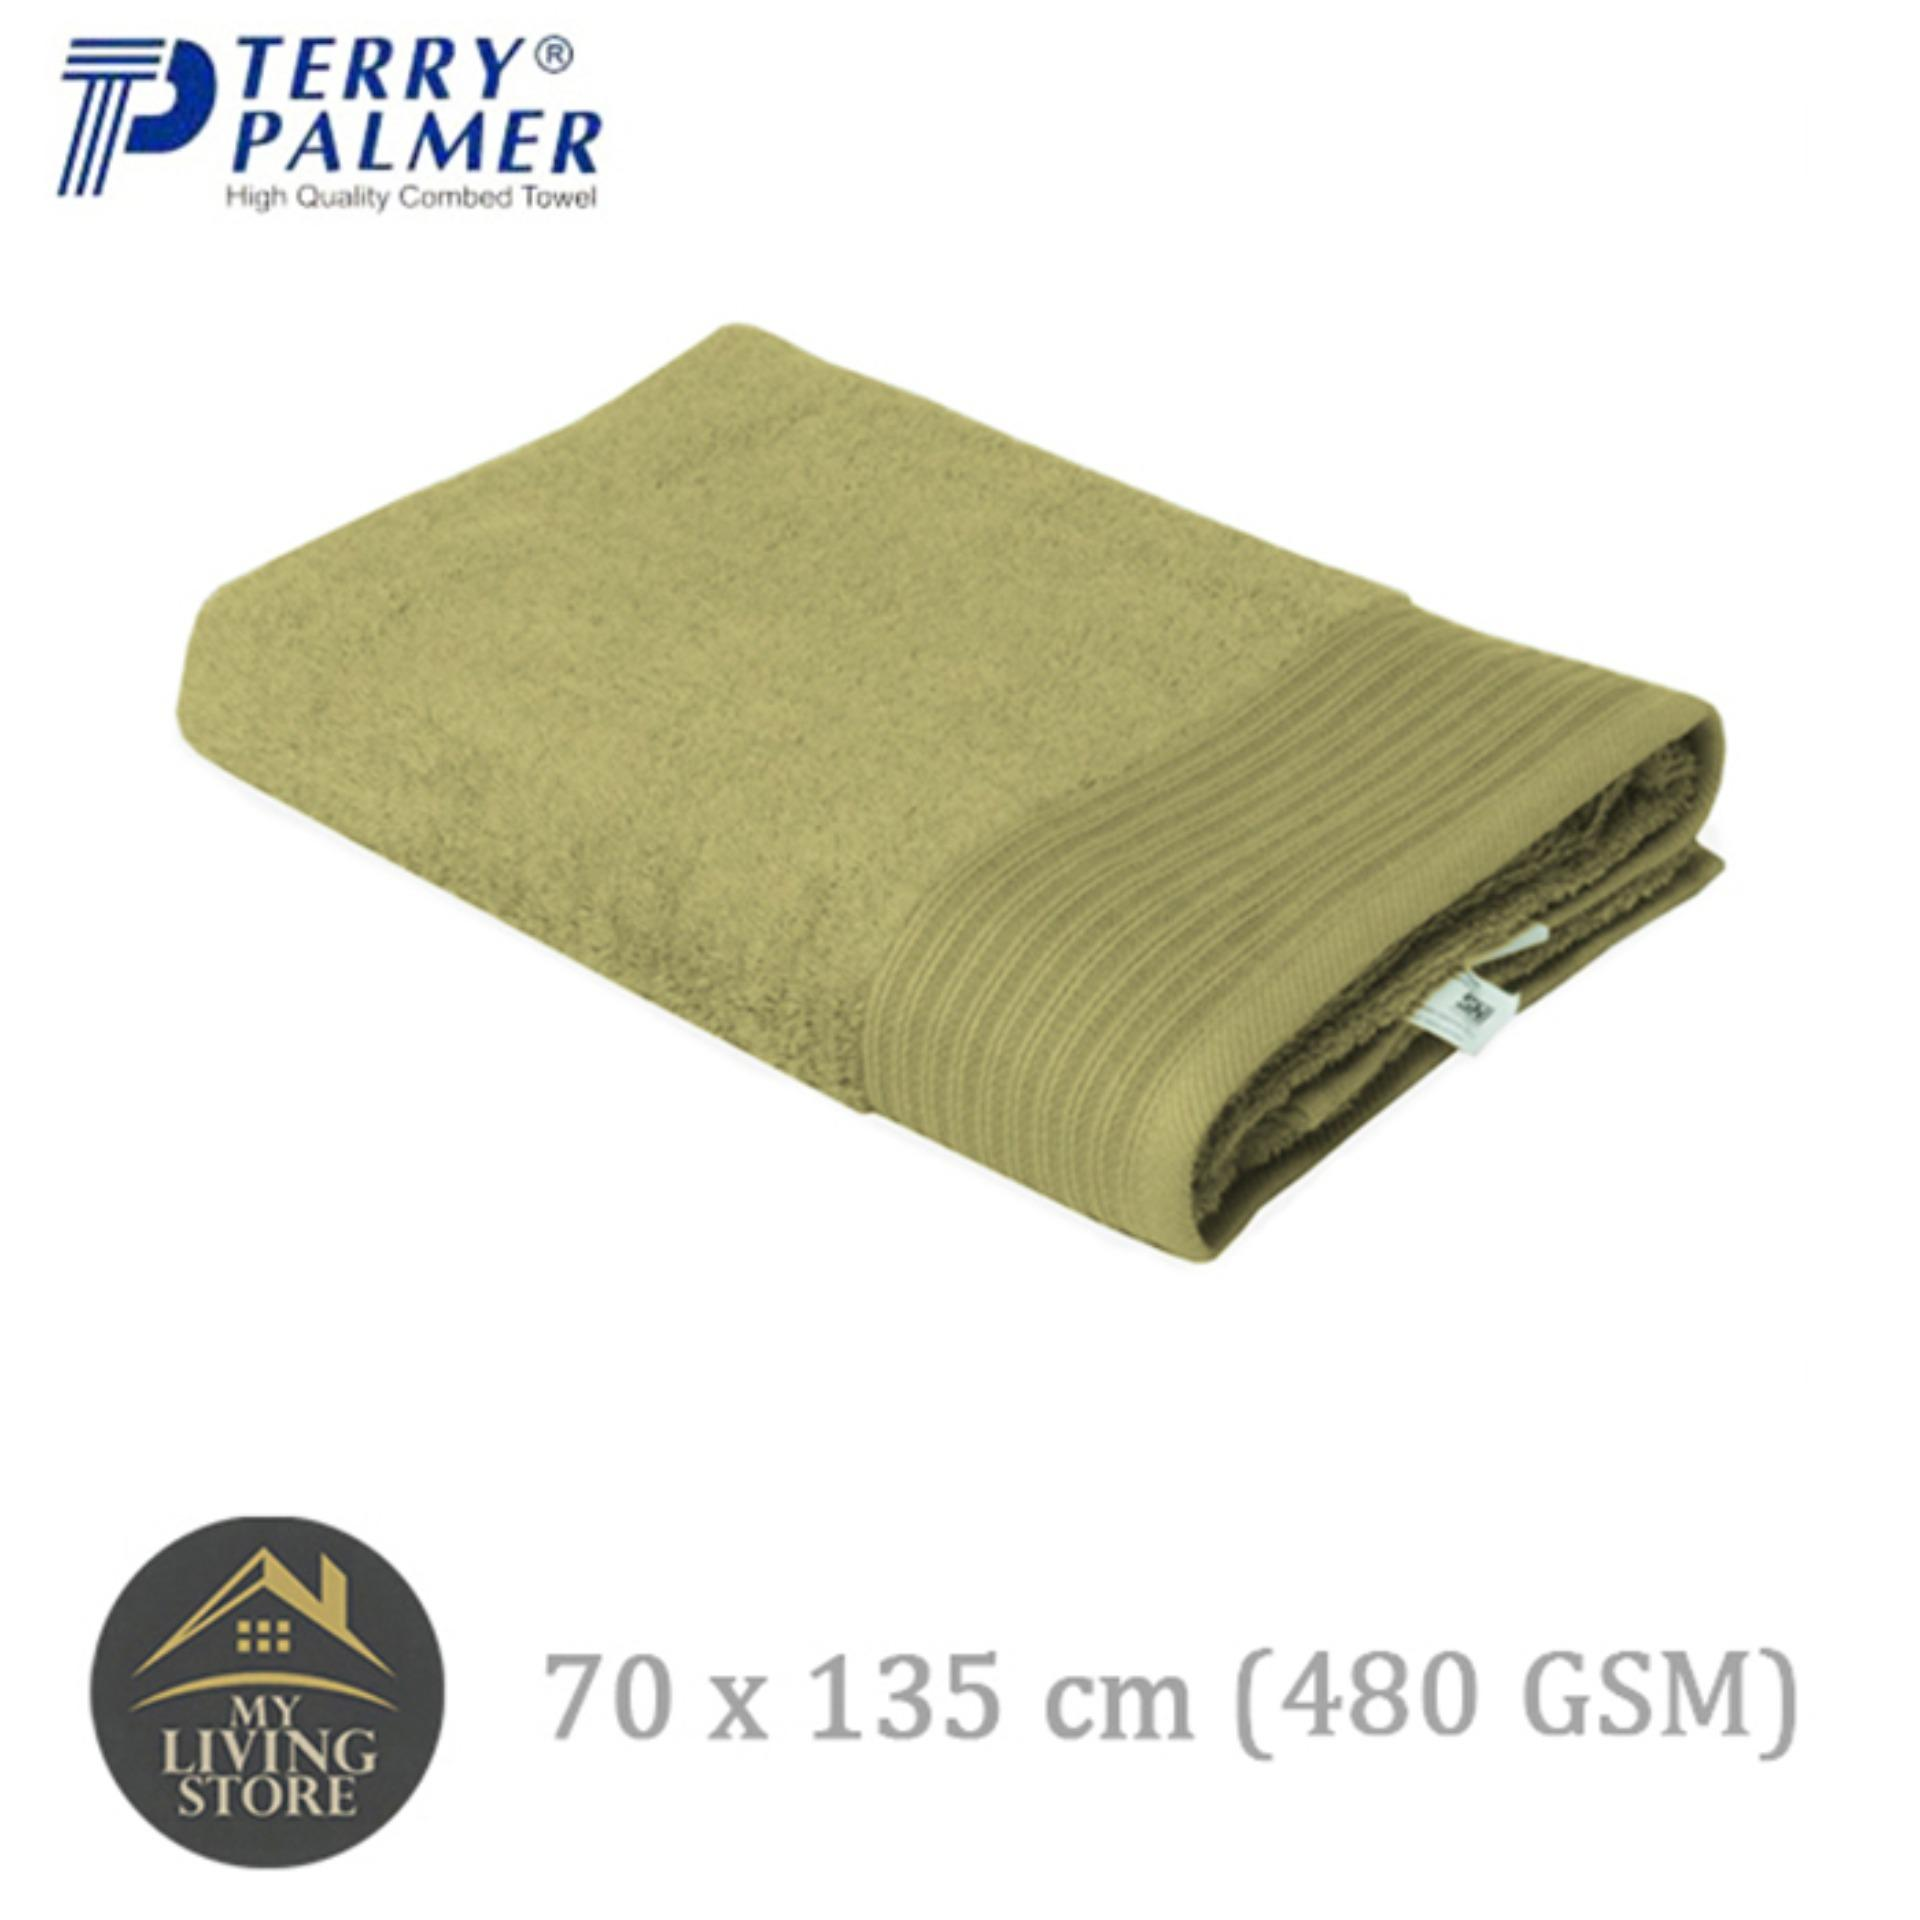 Spesifikasi Terry Palmer Handuk Eternal Bath Towel 70 X 135 Cm 480 Gsm Hijau Terry Palmer Terbaru